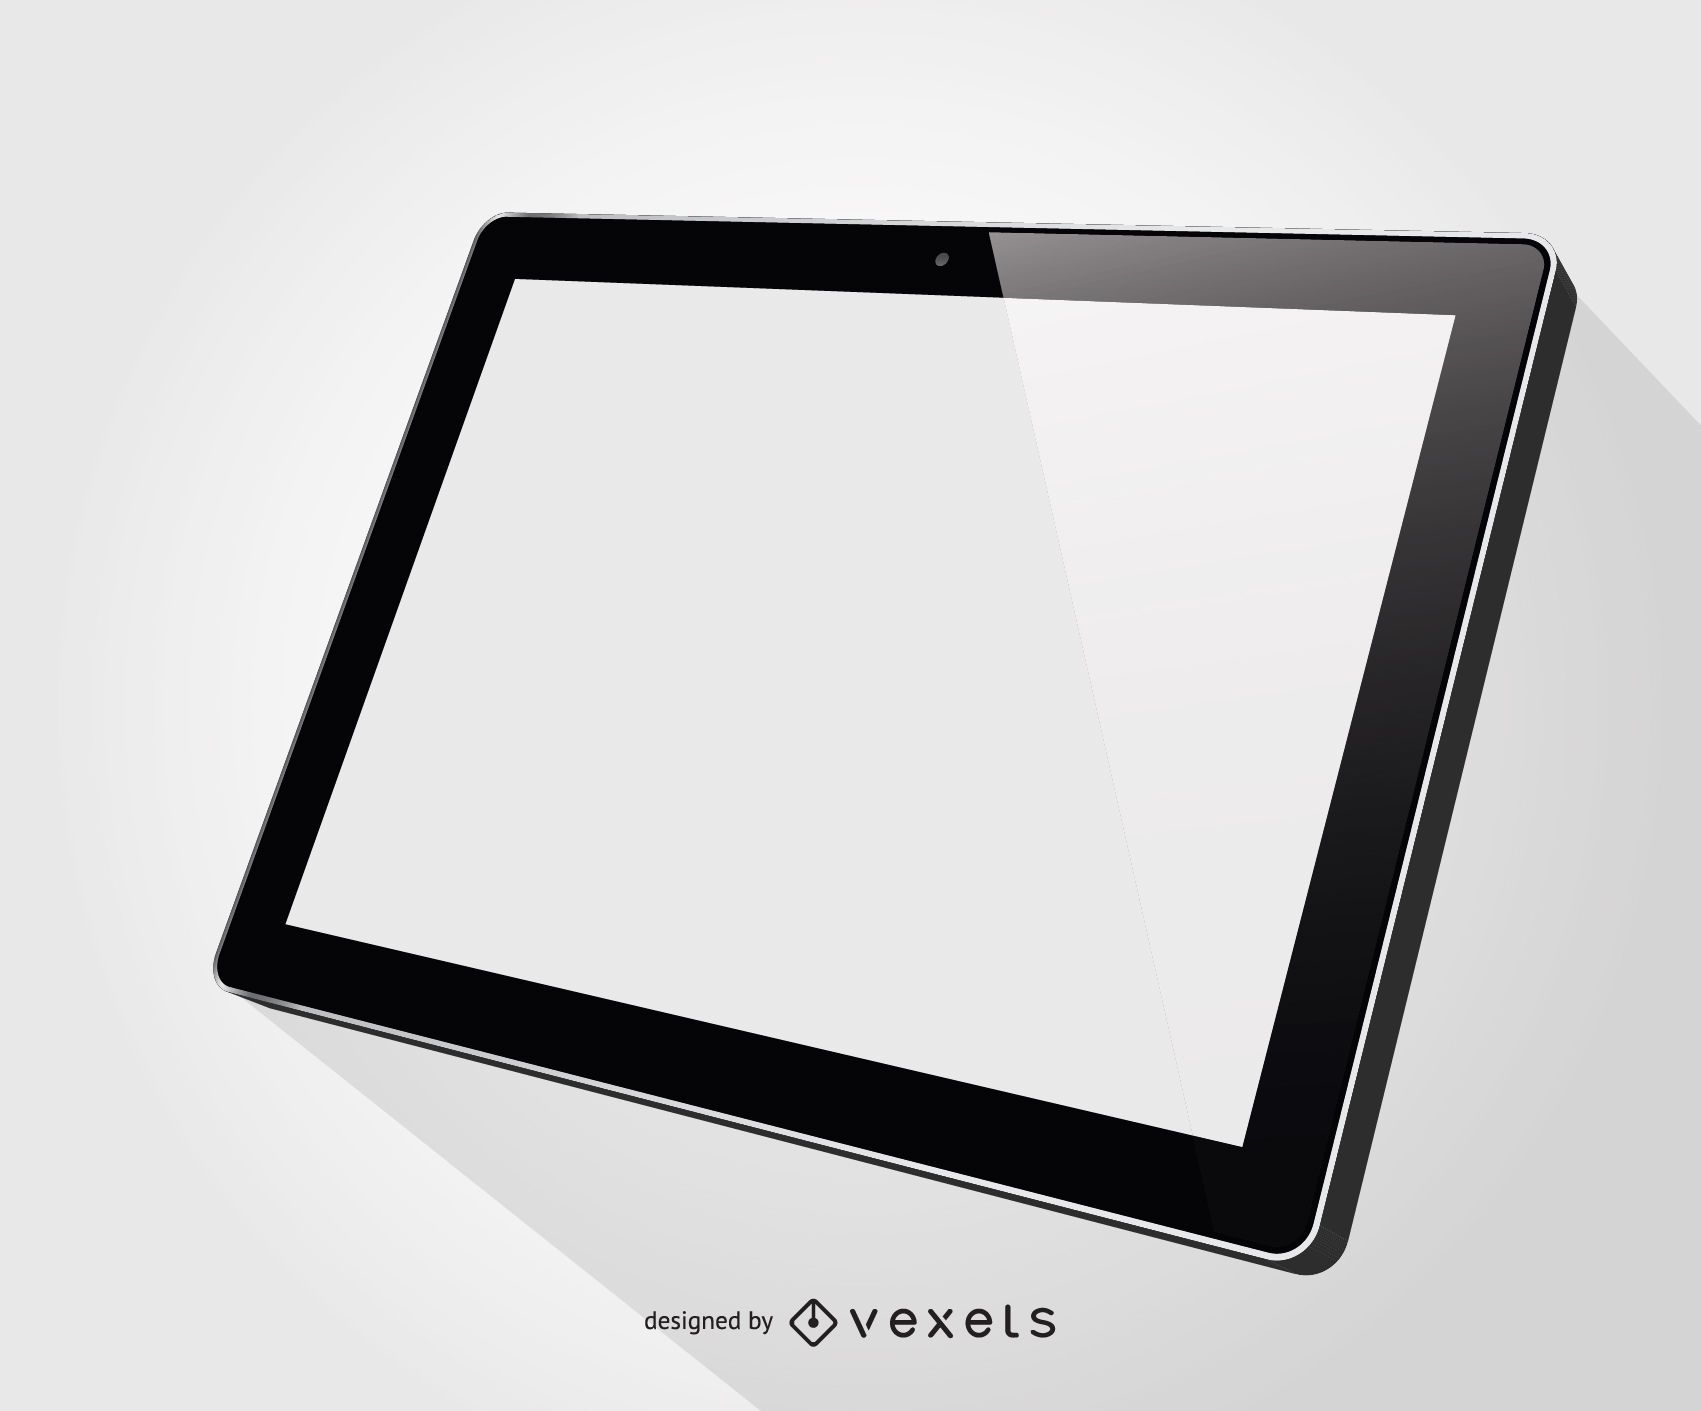 Ipad tablet blank illustration